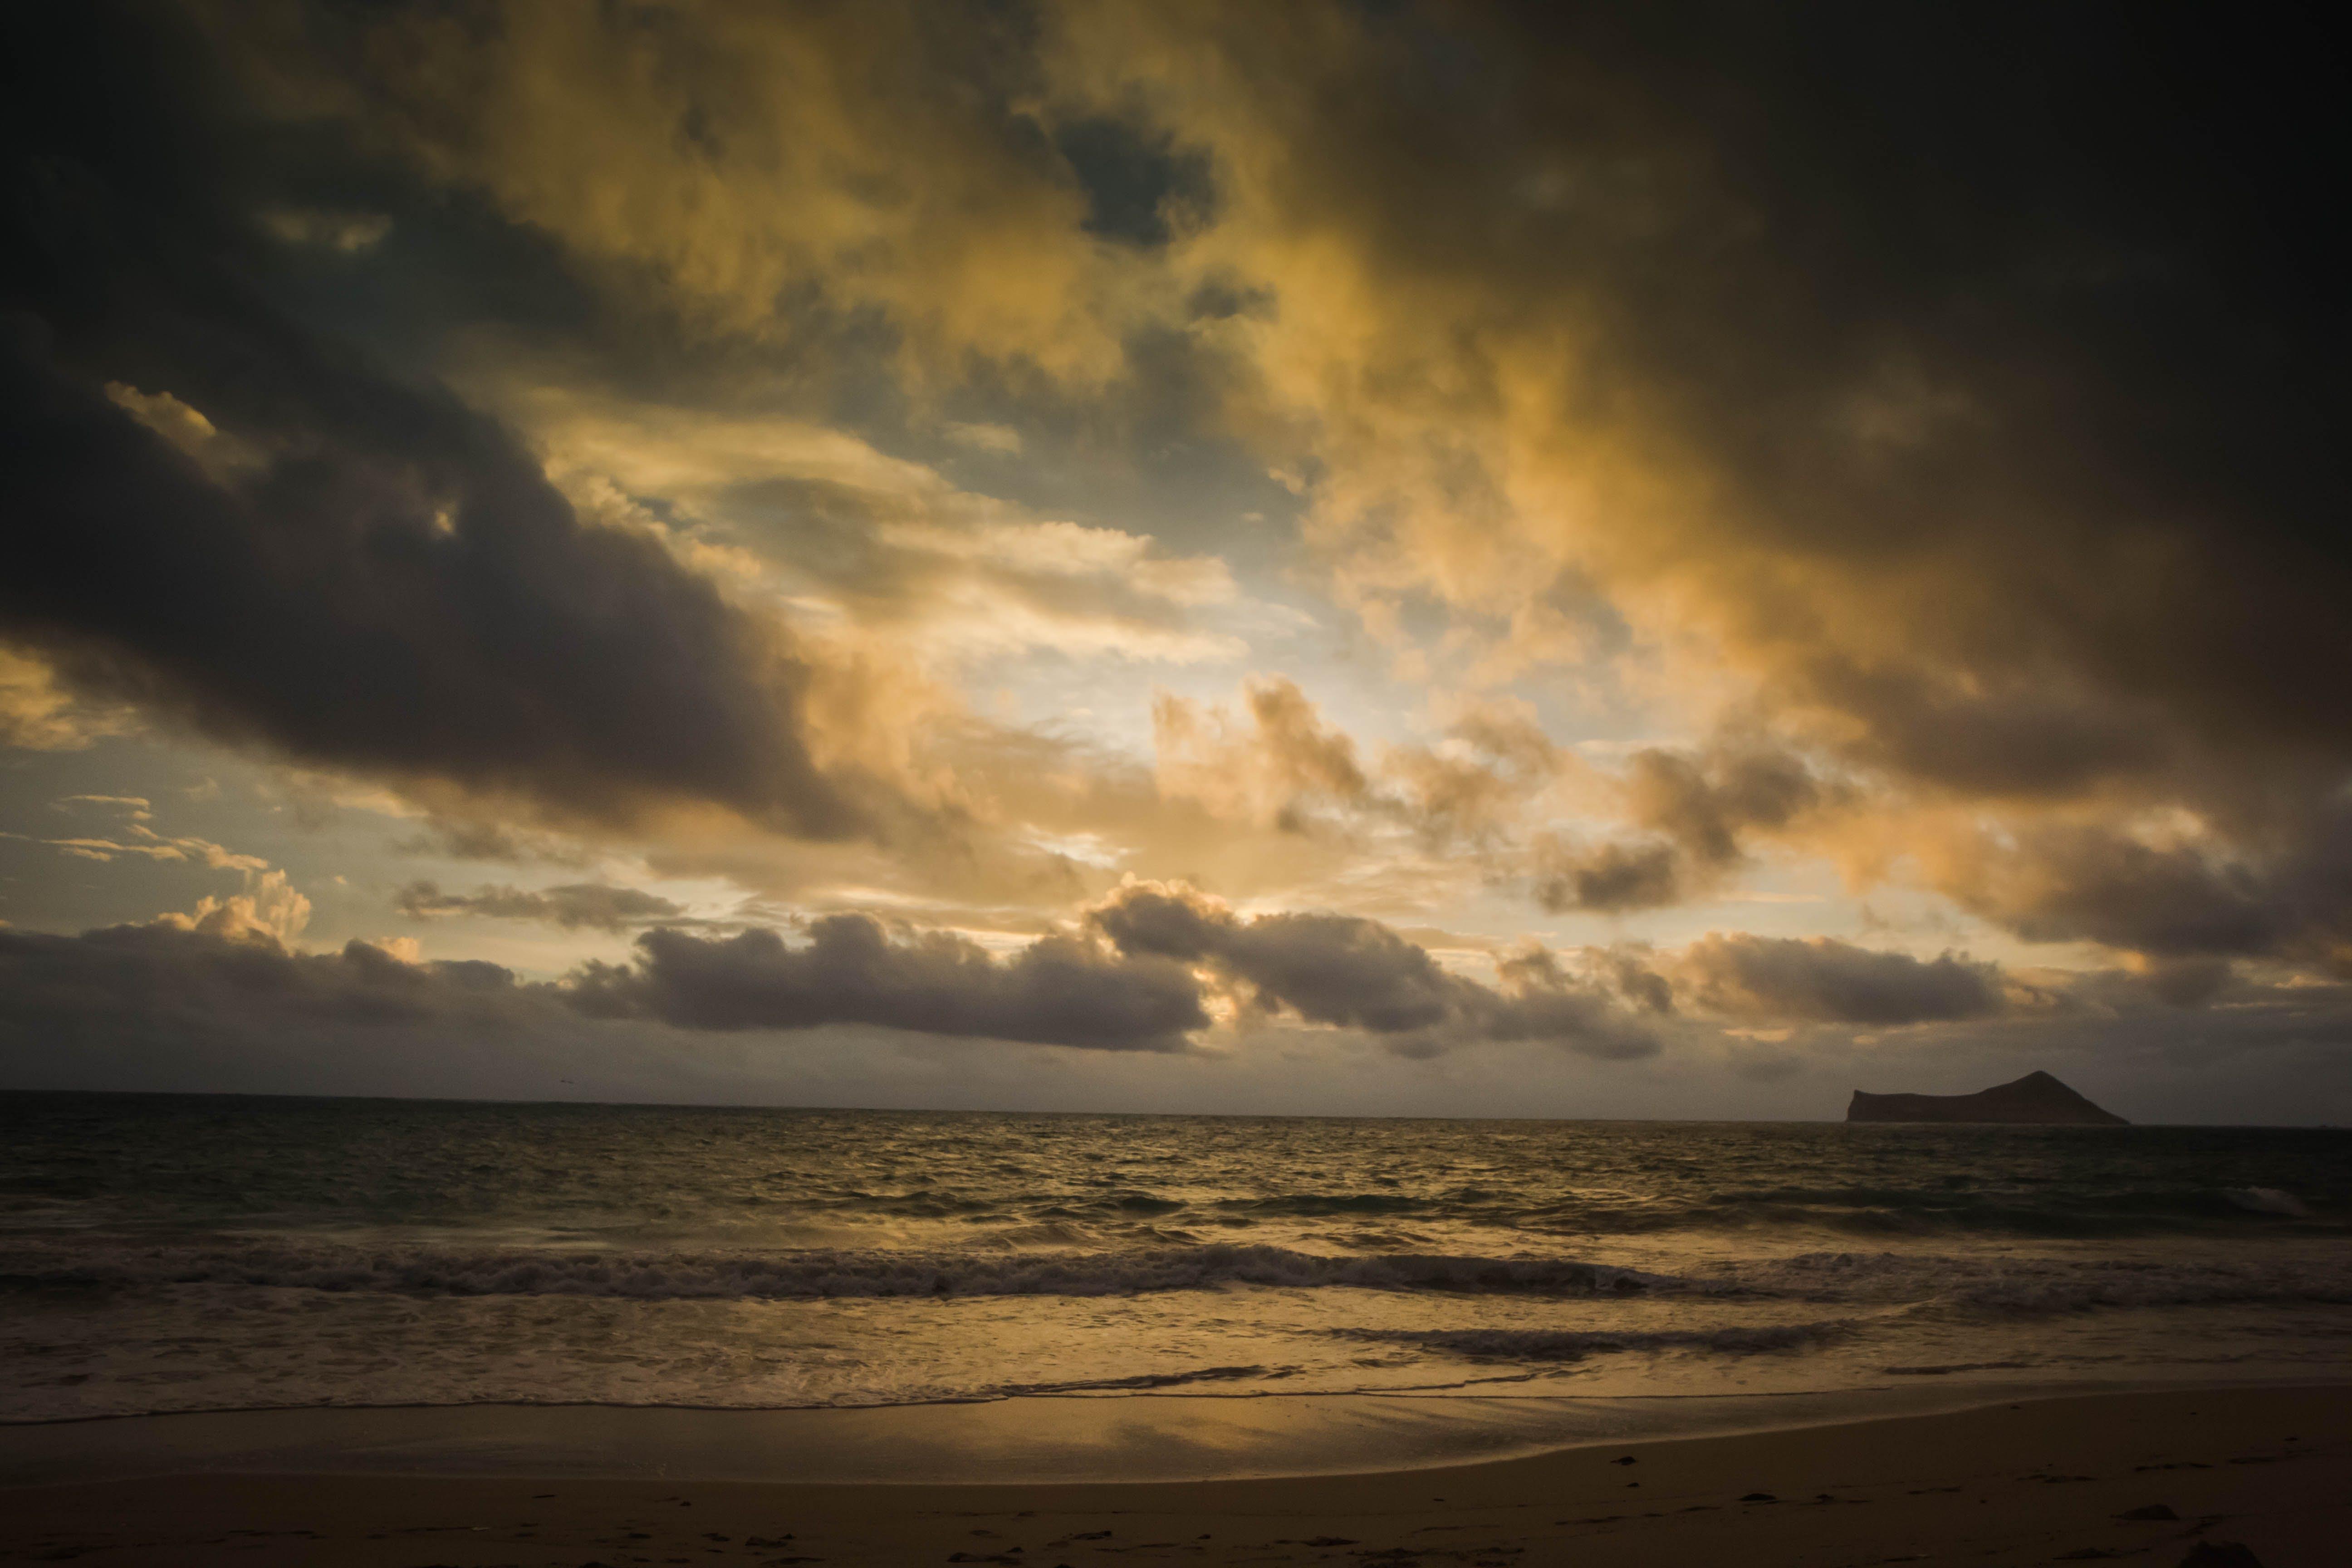 Free stock photo of sunset, beach, sunrise, island